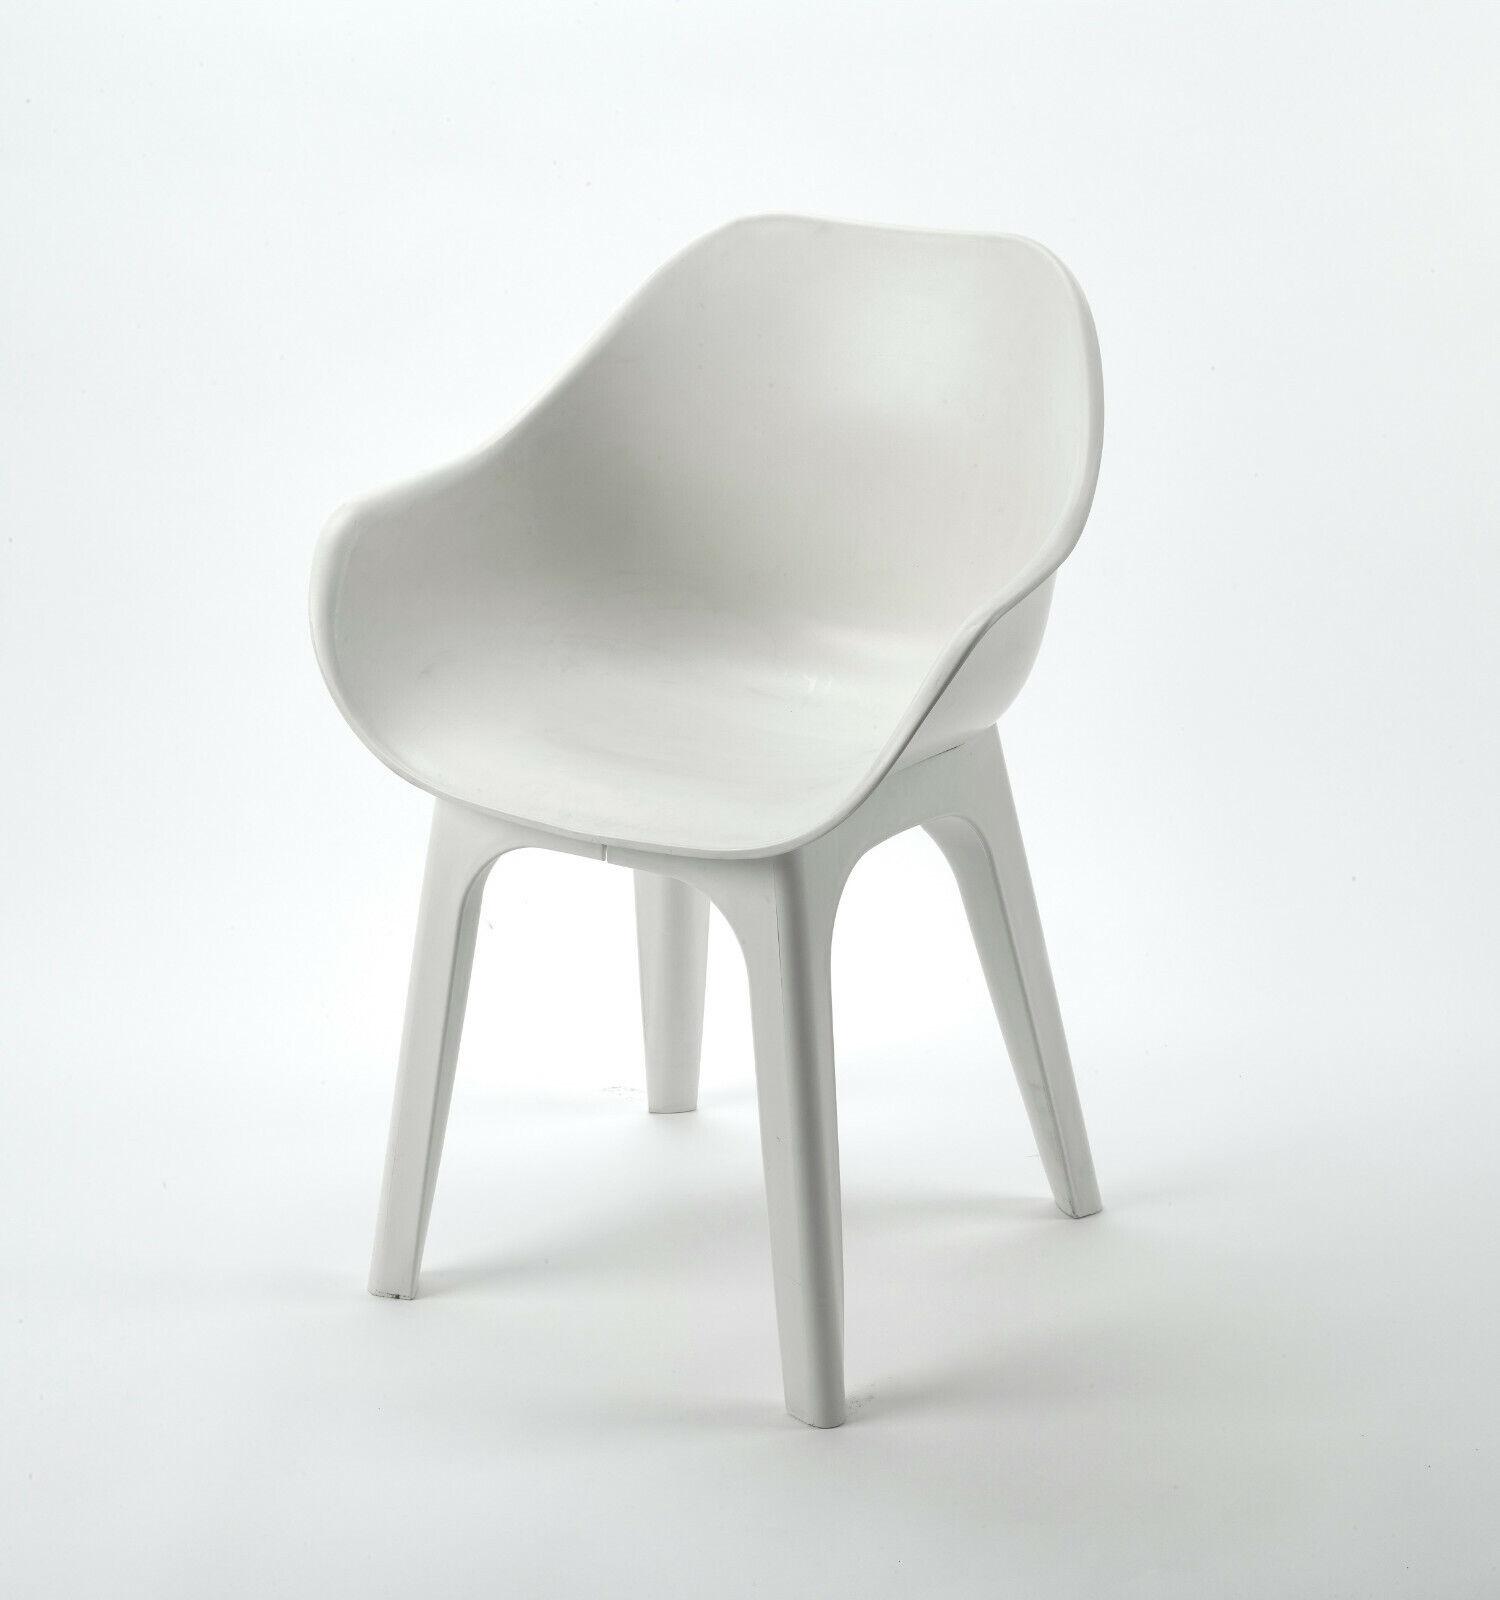 IPAE cásCocheas silla Ghibli blancoo cásCocheas sillón Lounge sillón muebles de jardín silla de jardín